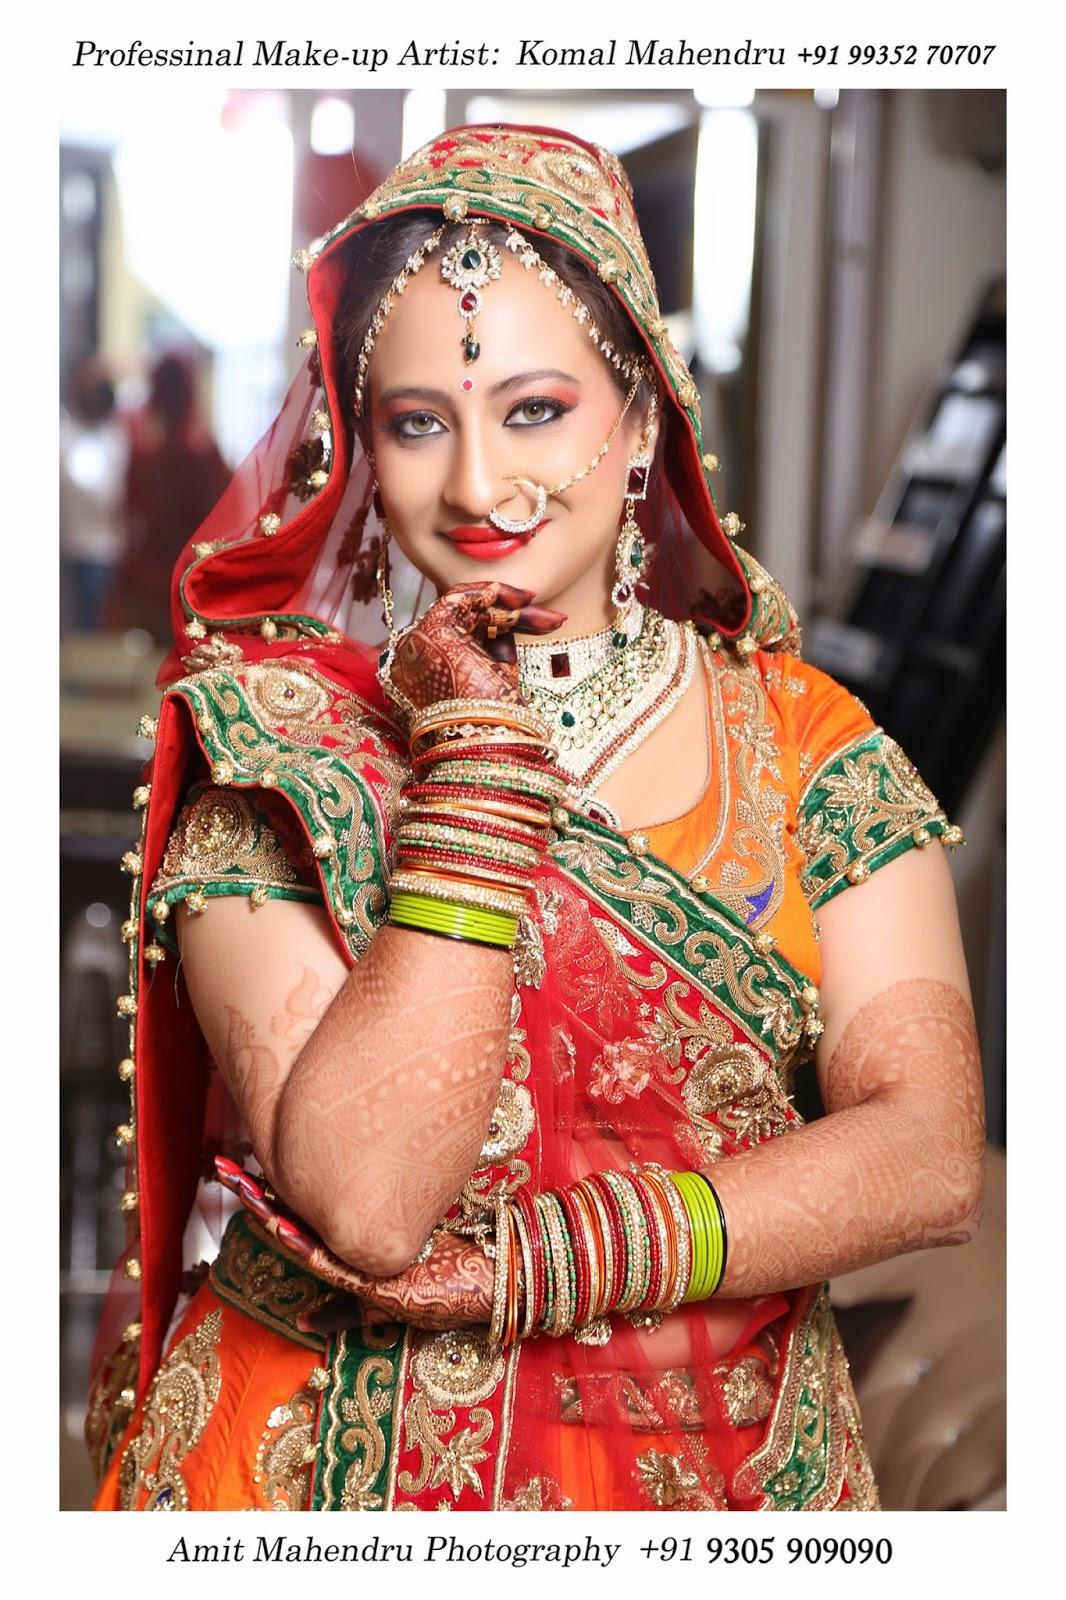 Komal mahendru s professional makeup lucknow india bridal makeup - Professional Makeup Artist In Lucknow